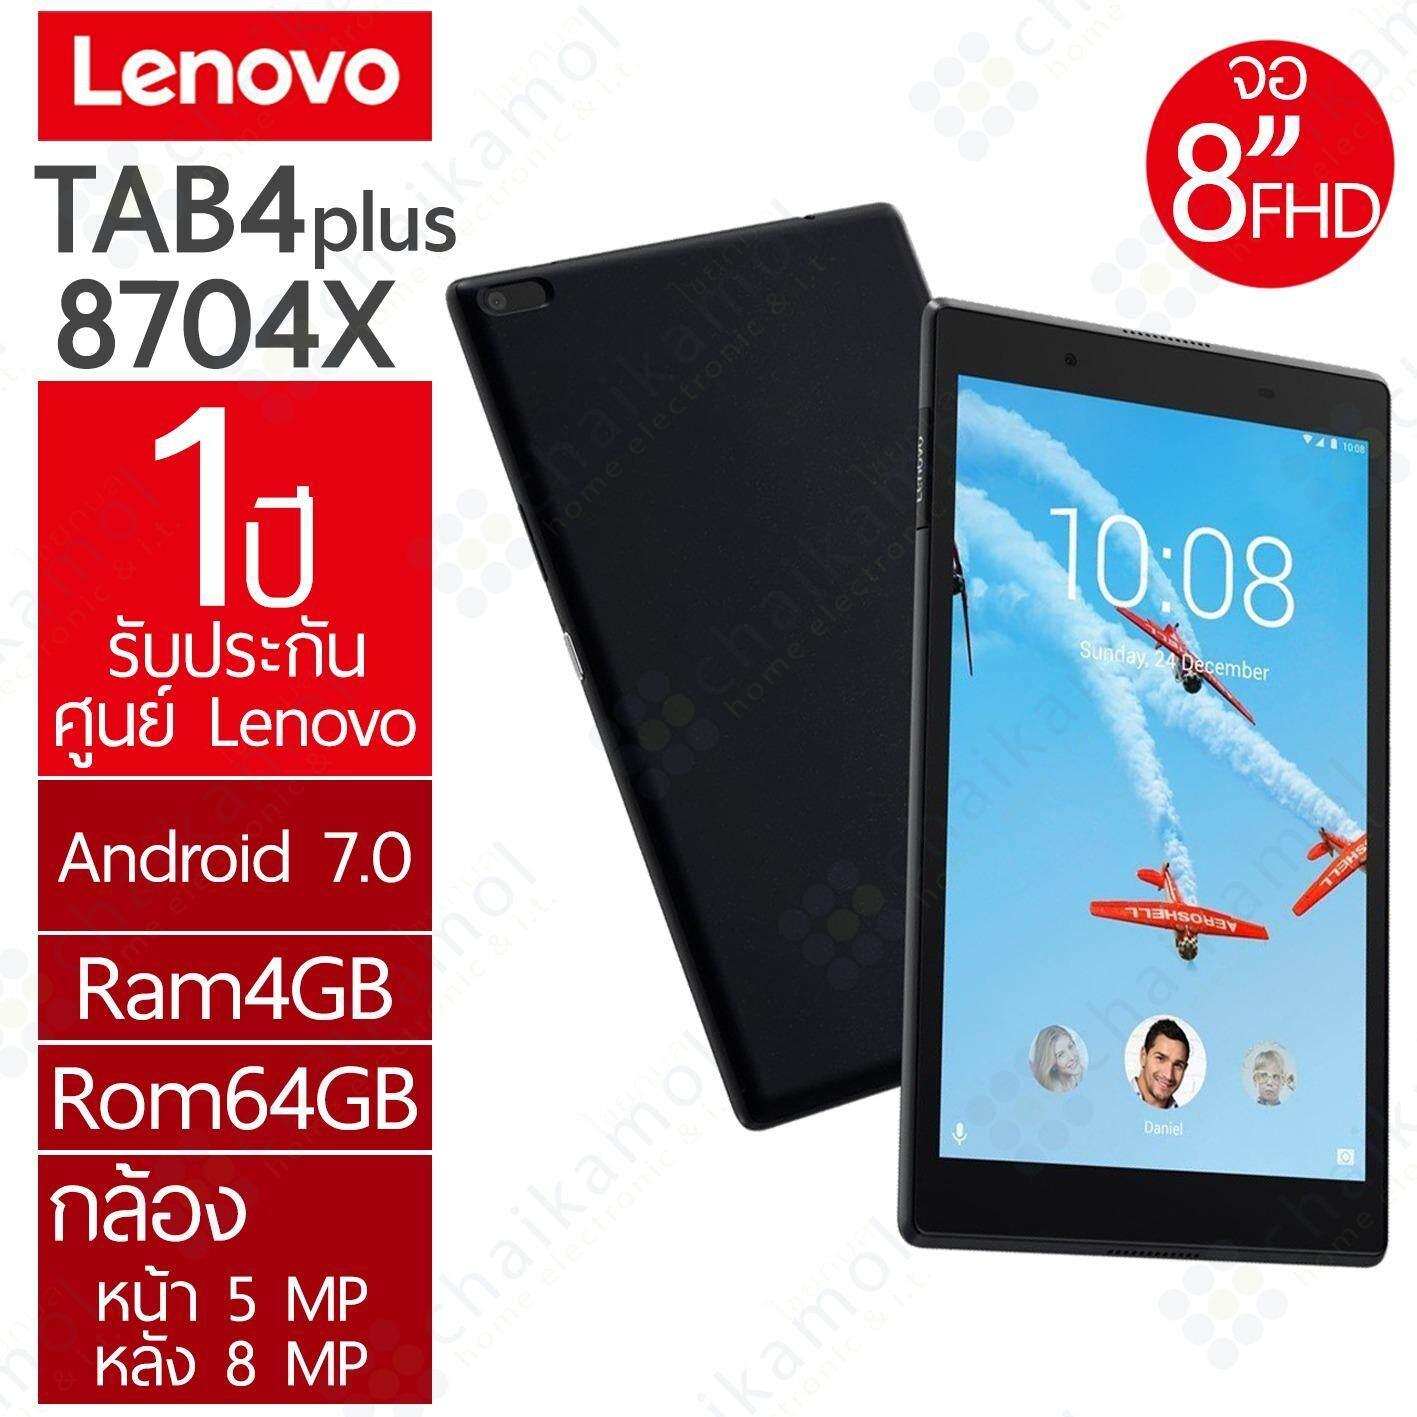 "Lenovo Tablet TAB4 8 Plus - 8704X 8"" FHD / กล้อง 5MP-8MP / Ram 4GB / Rom 64GB /  LTE / 2ซิม"